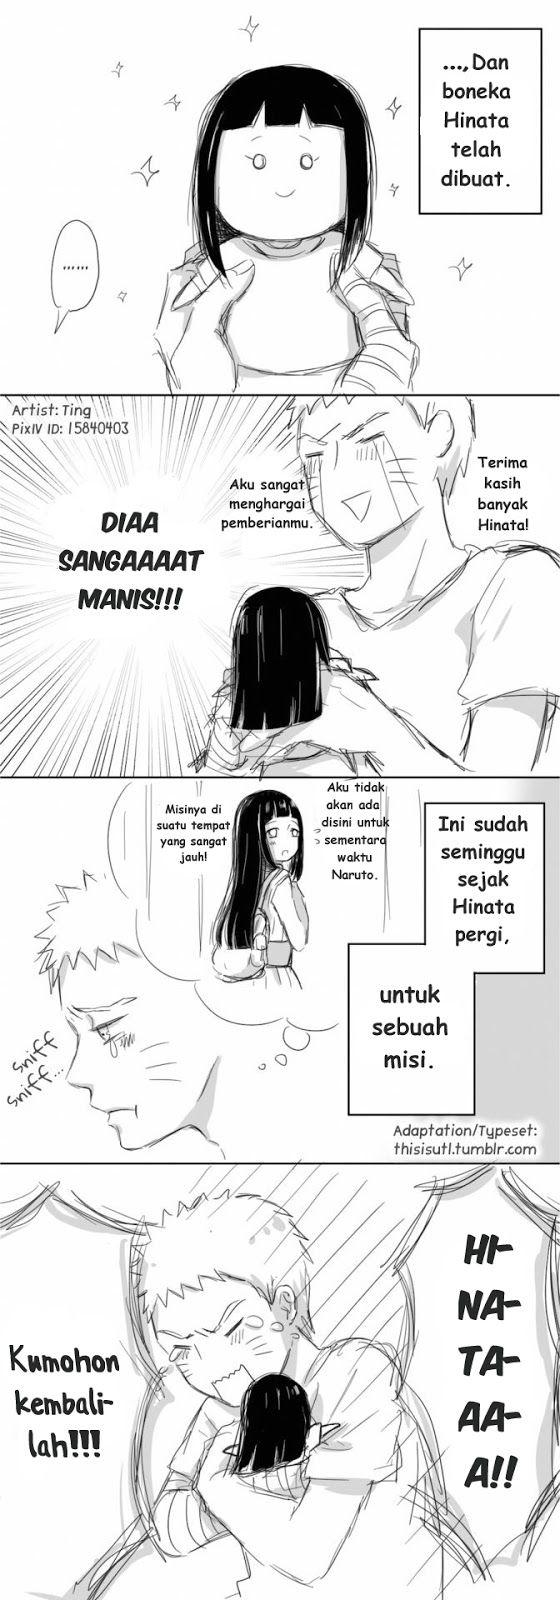 Komik NaruHina | Boneka Hinata | Bahasa Indonesia (2)